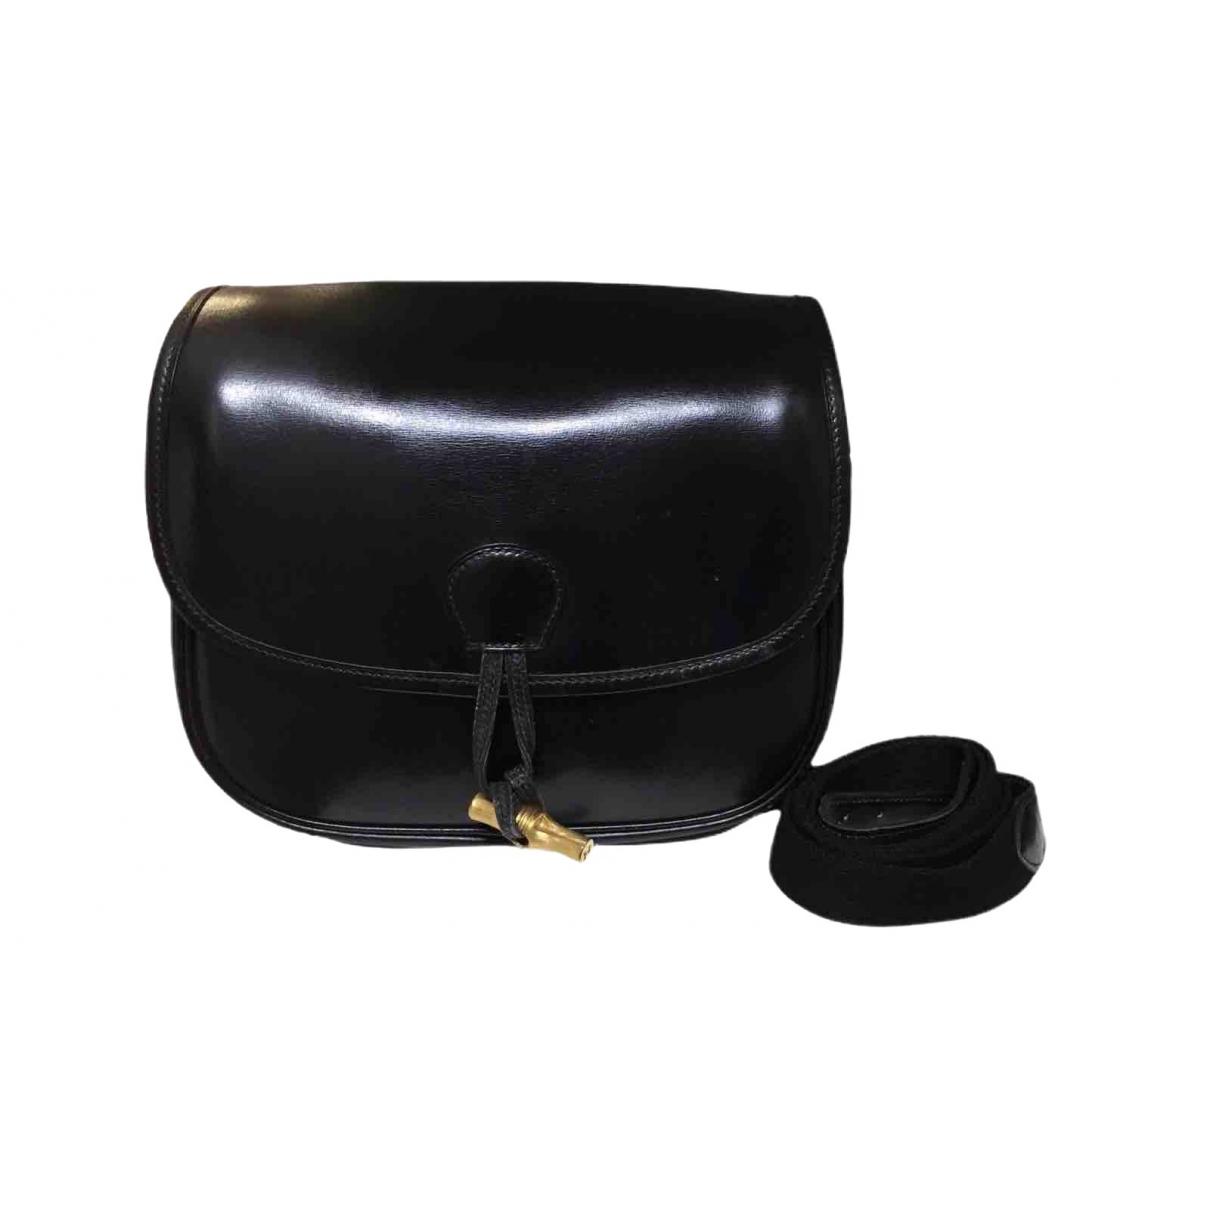 Hermès \N Black Leather handbag for Women \N